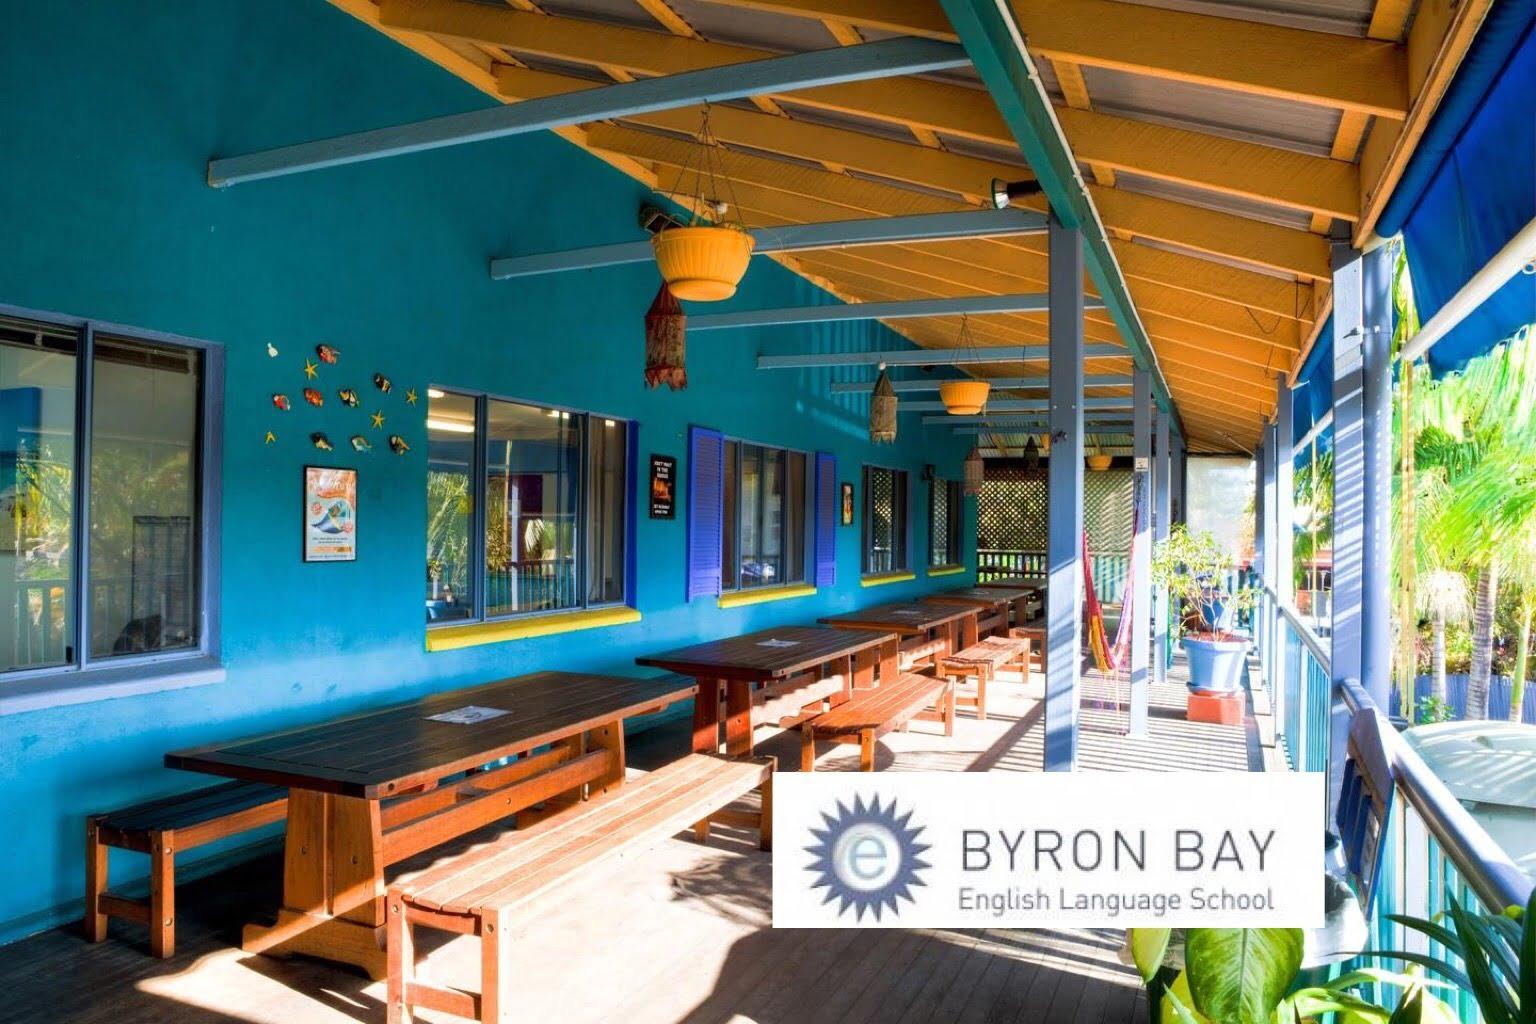 Byron Bay English Language School (BBELS) 拜倫灣英語學校